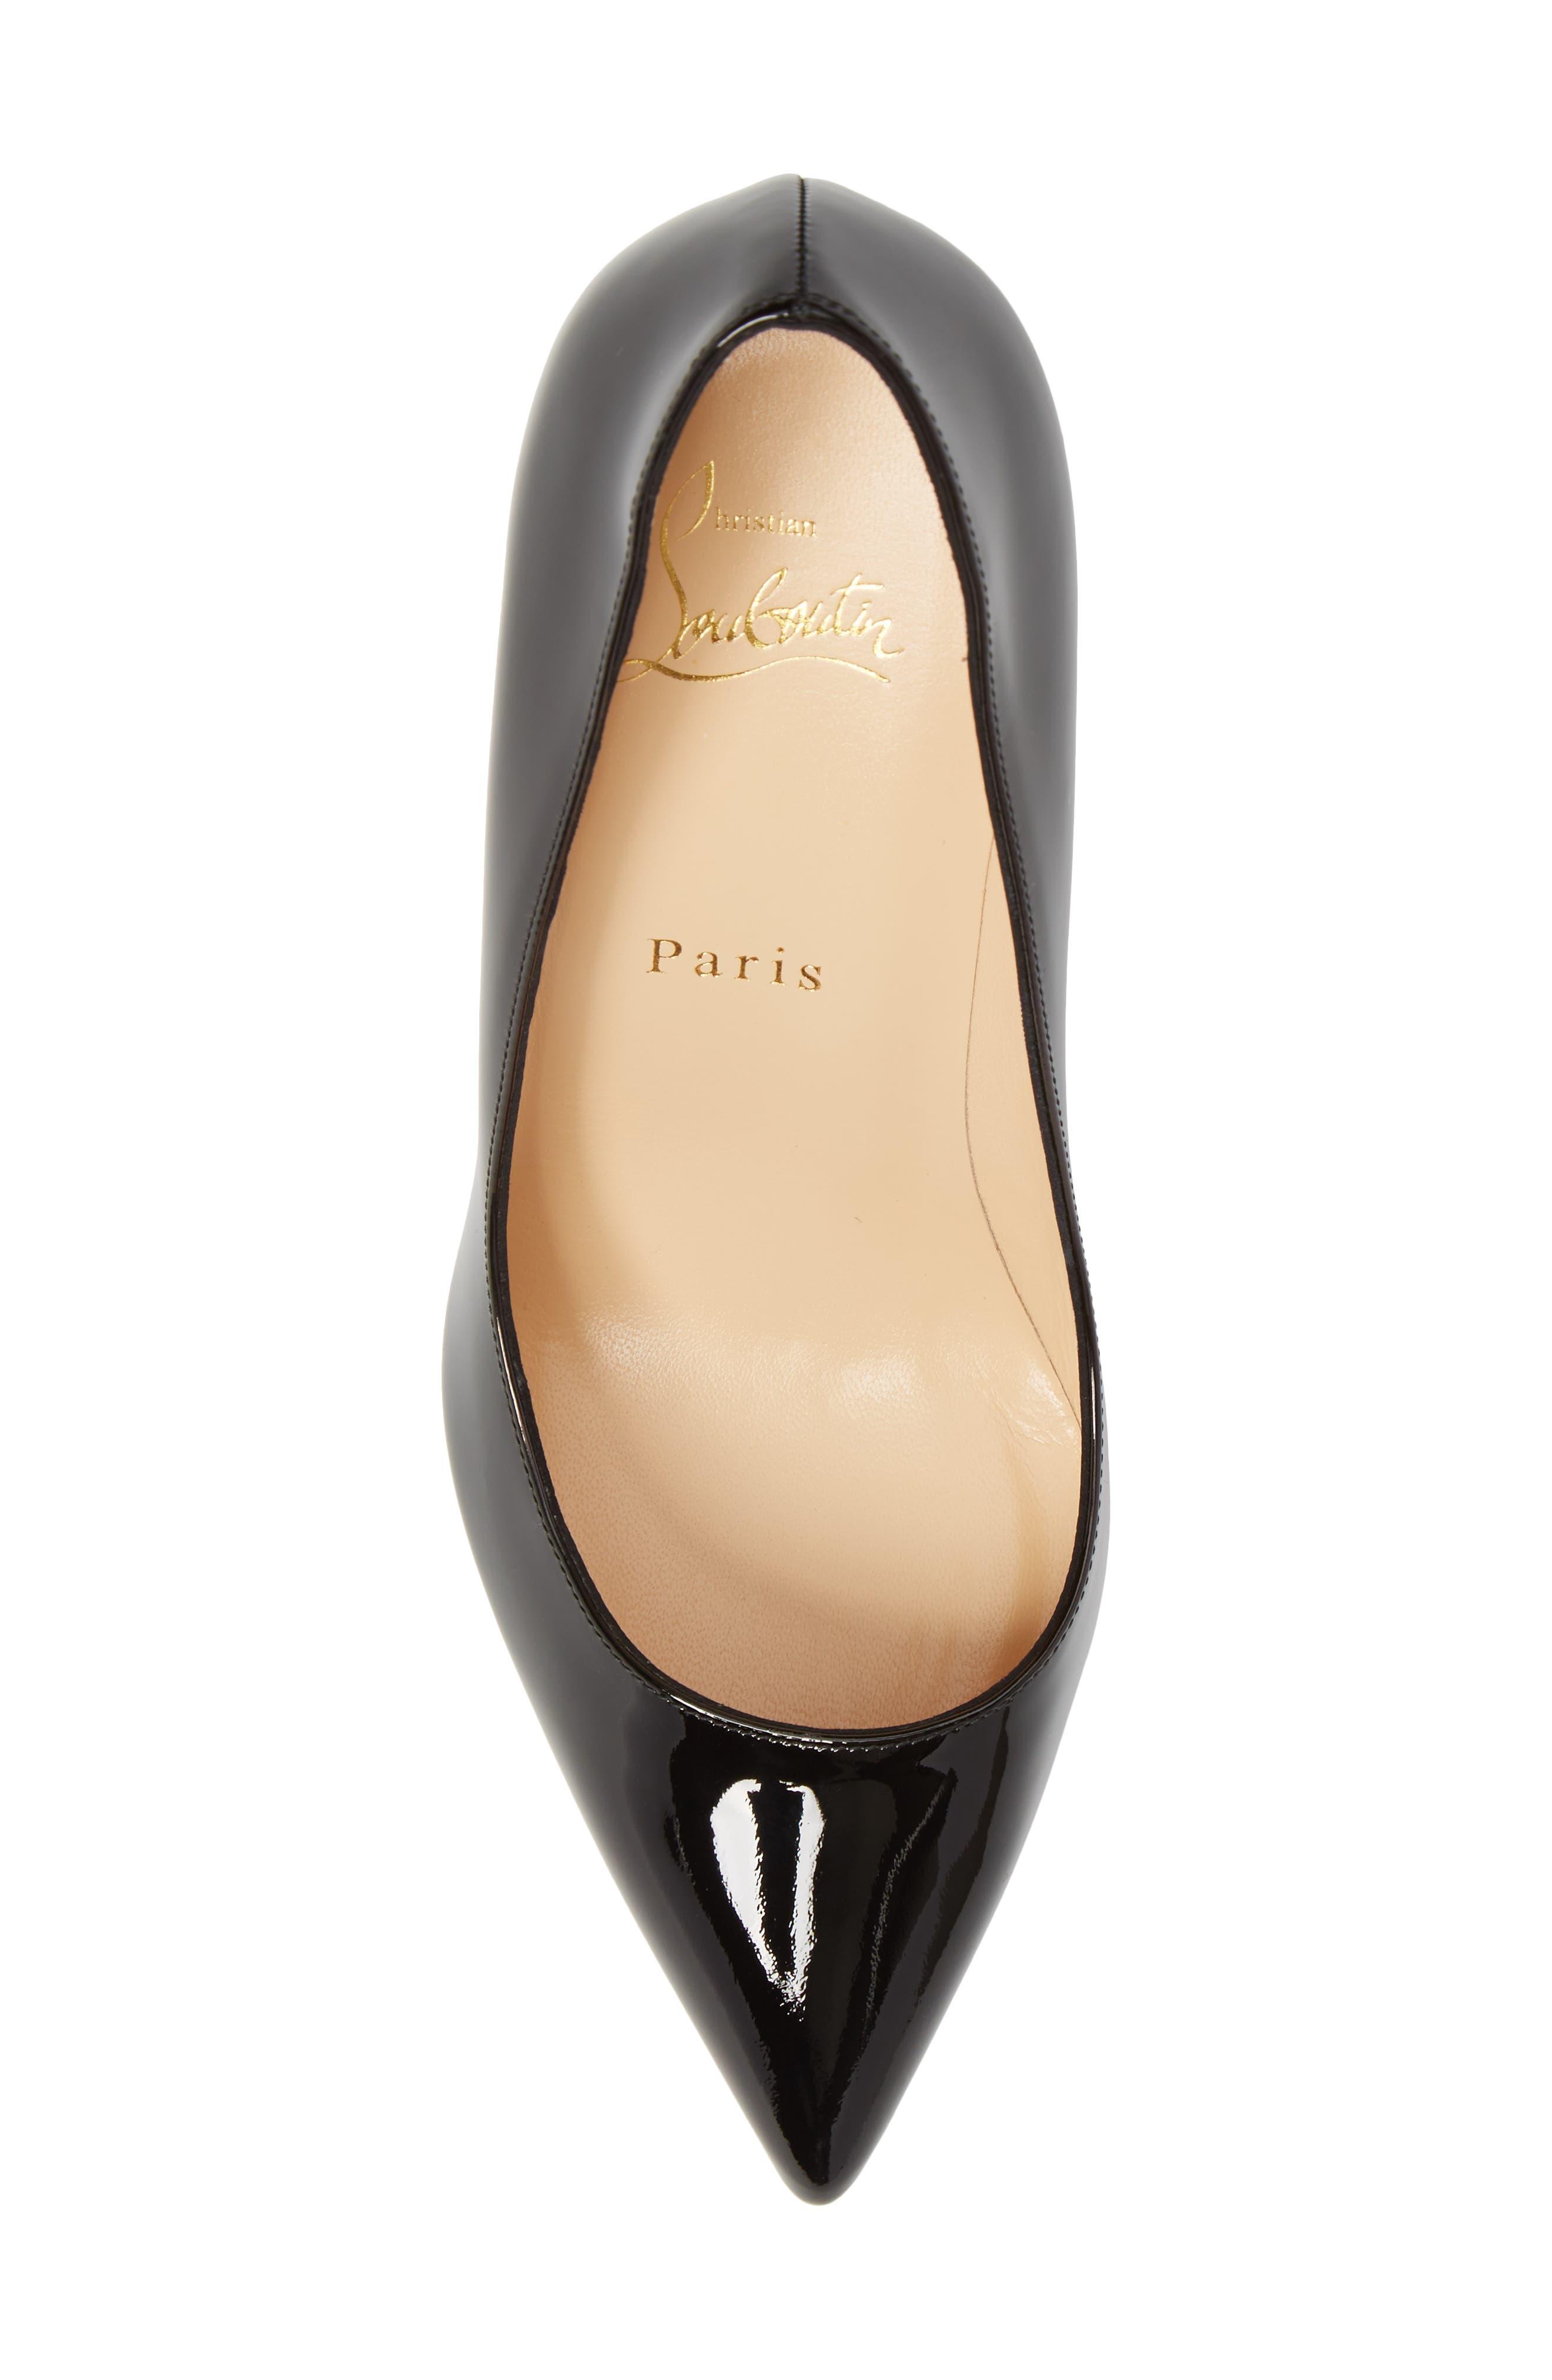 Pigalle Plato Pointy Toe Platform Pump,                             Alternate thumbnail 5, color,                             Black Patent